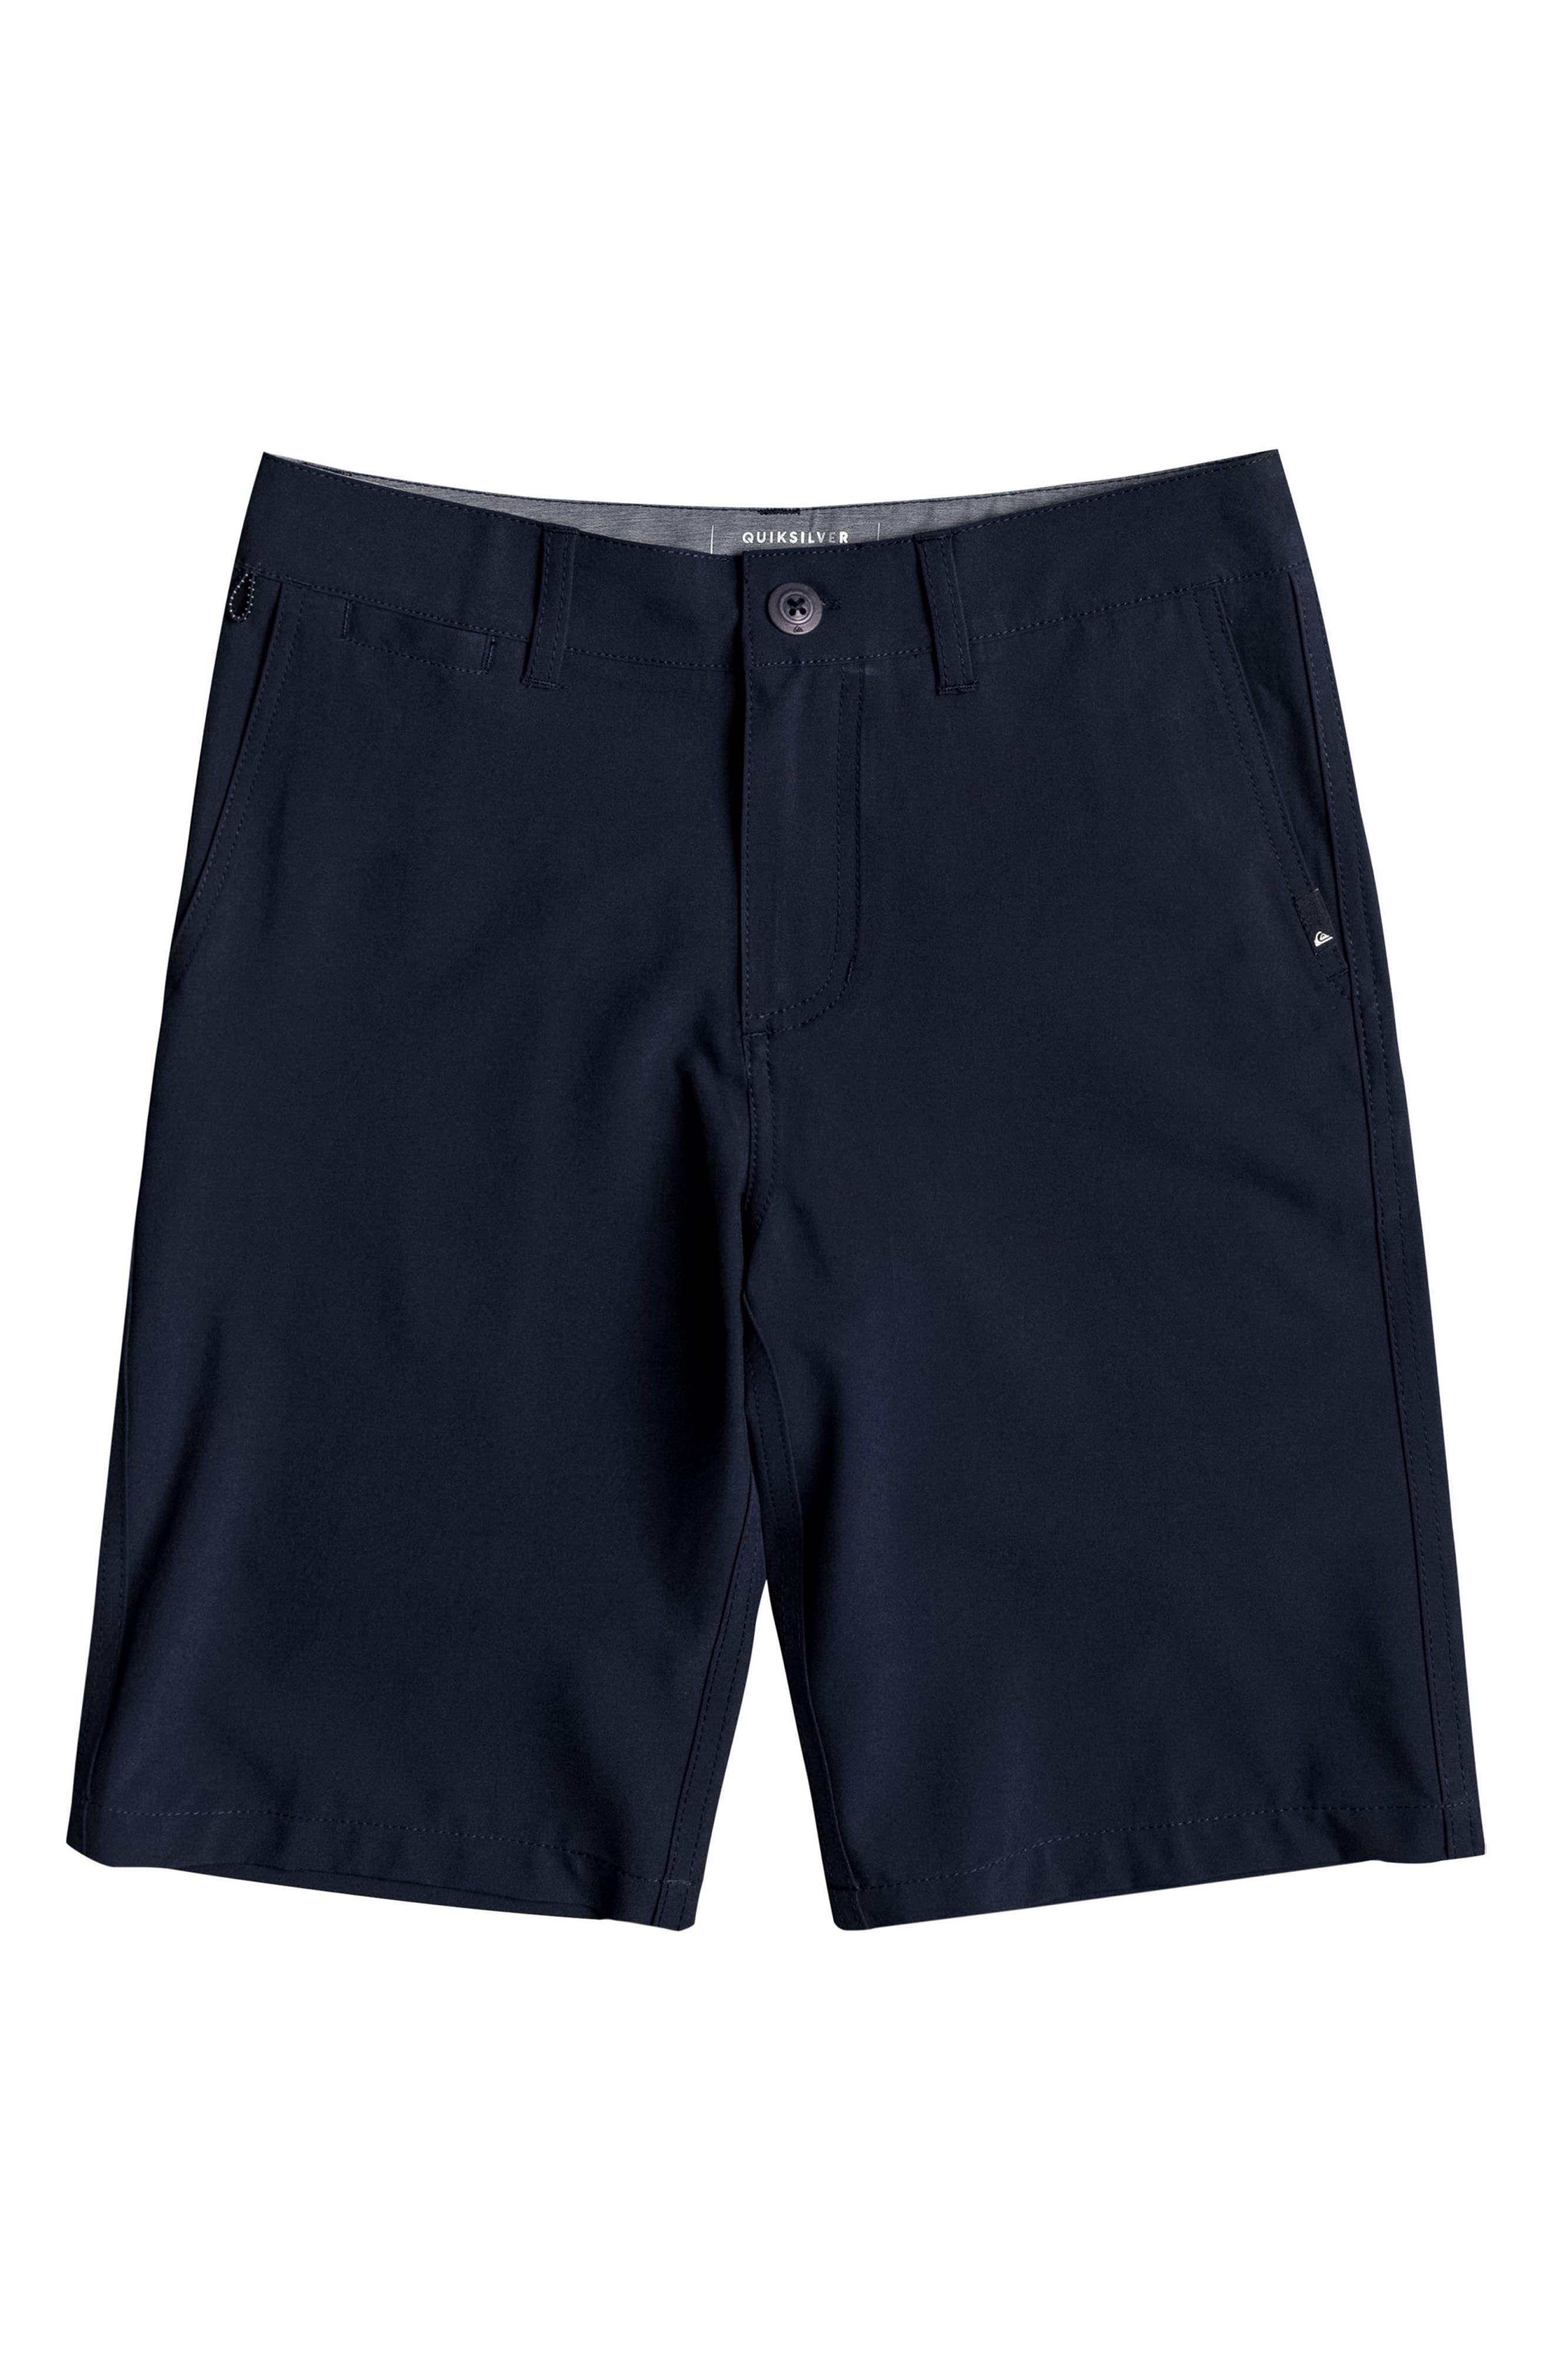 Main Image - Quiksilver Union Amphibian Board Shorts (Big Boys)